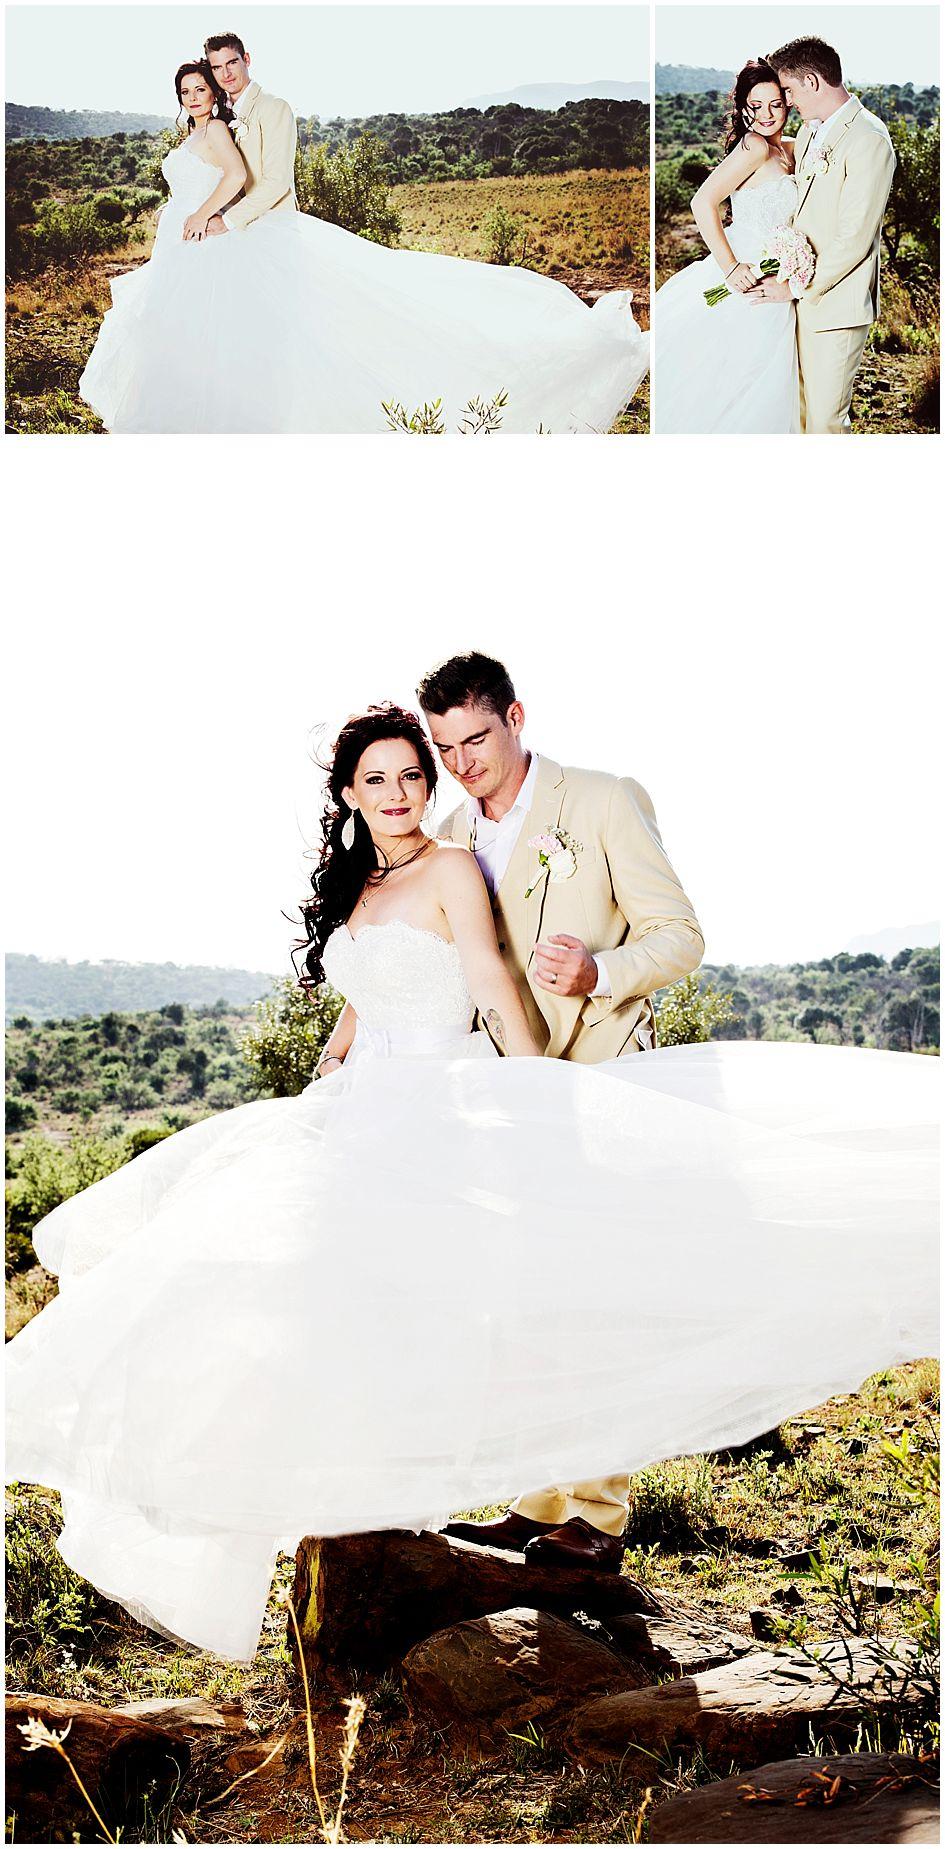 creative-askari-wedding-photoshoot.jpg